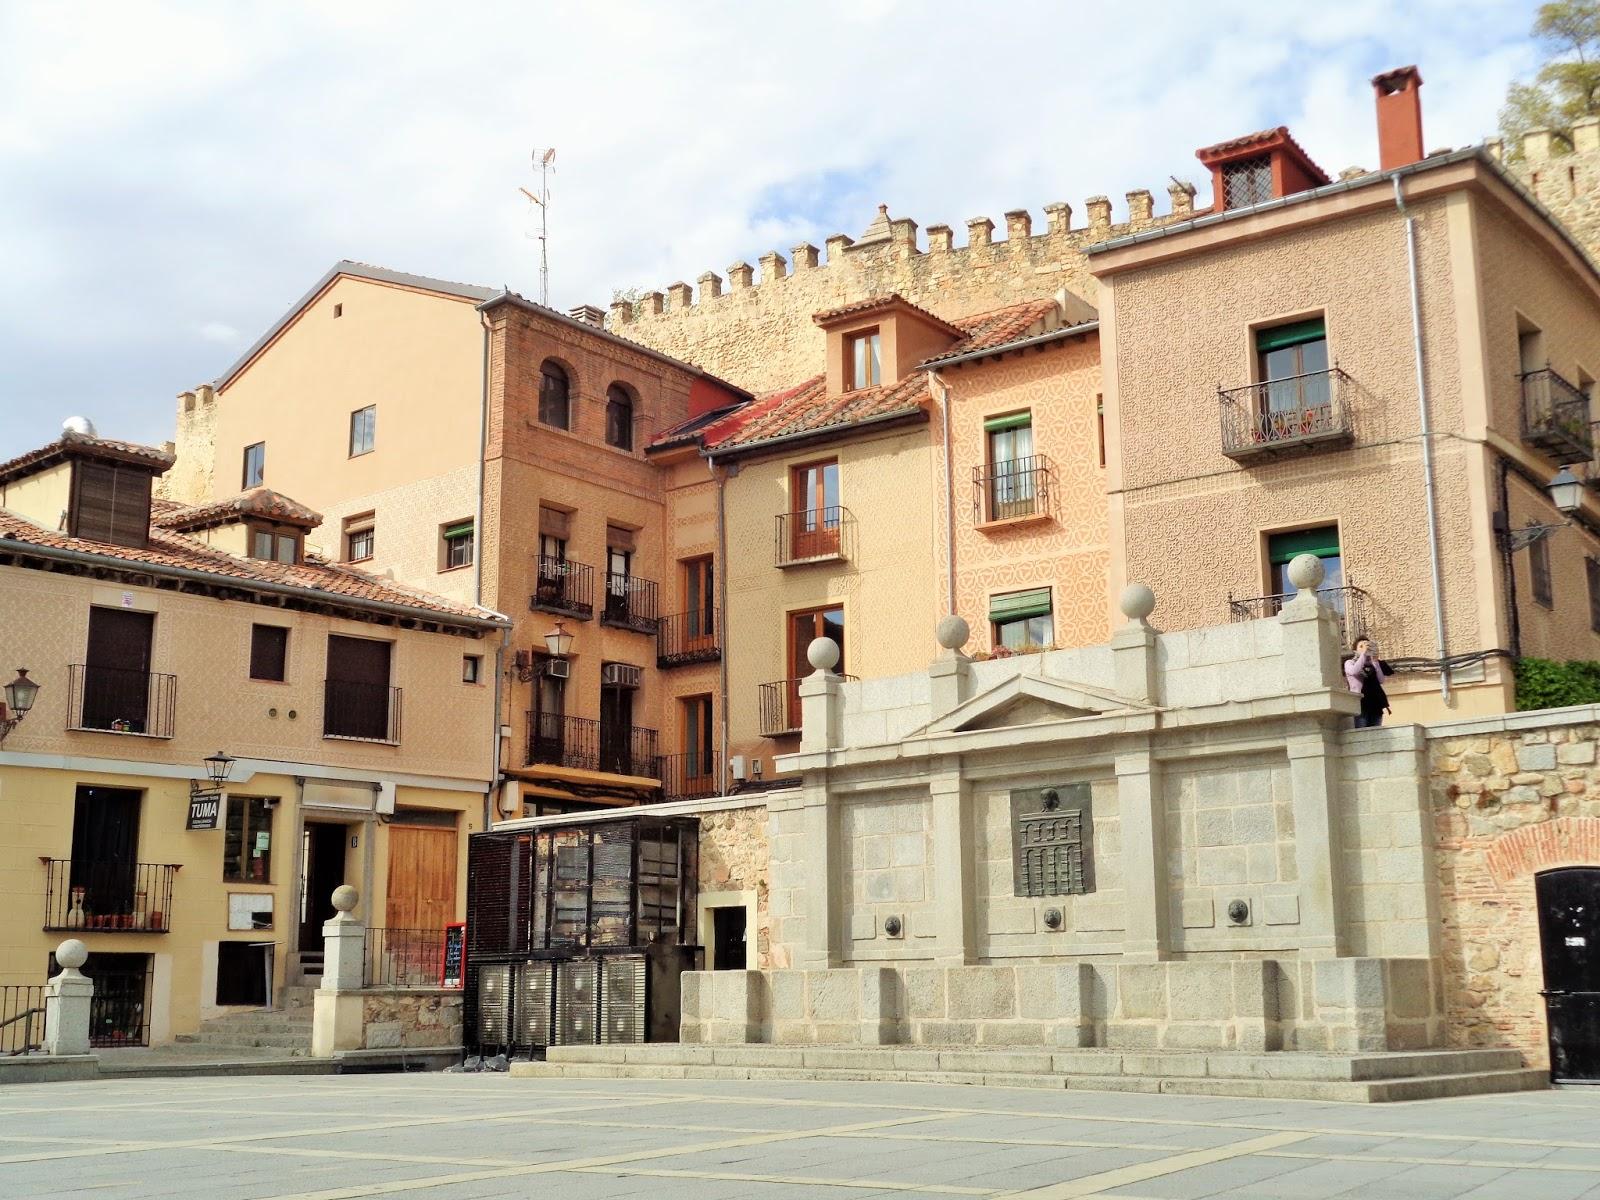 Exploring Segovia, Spain